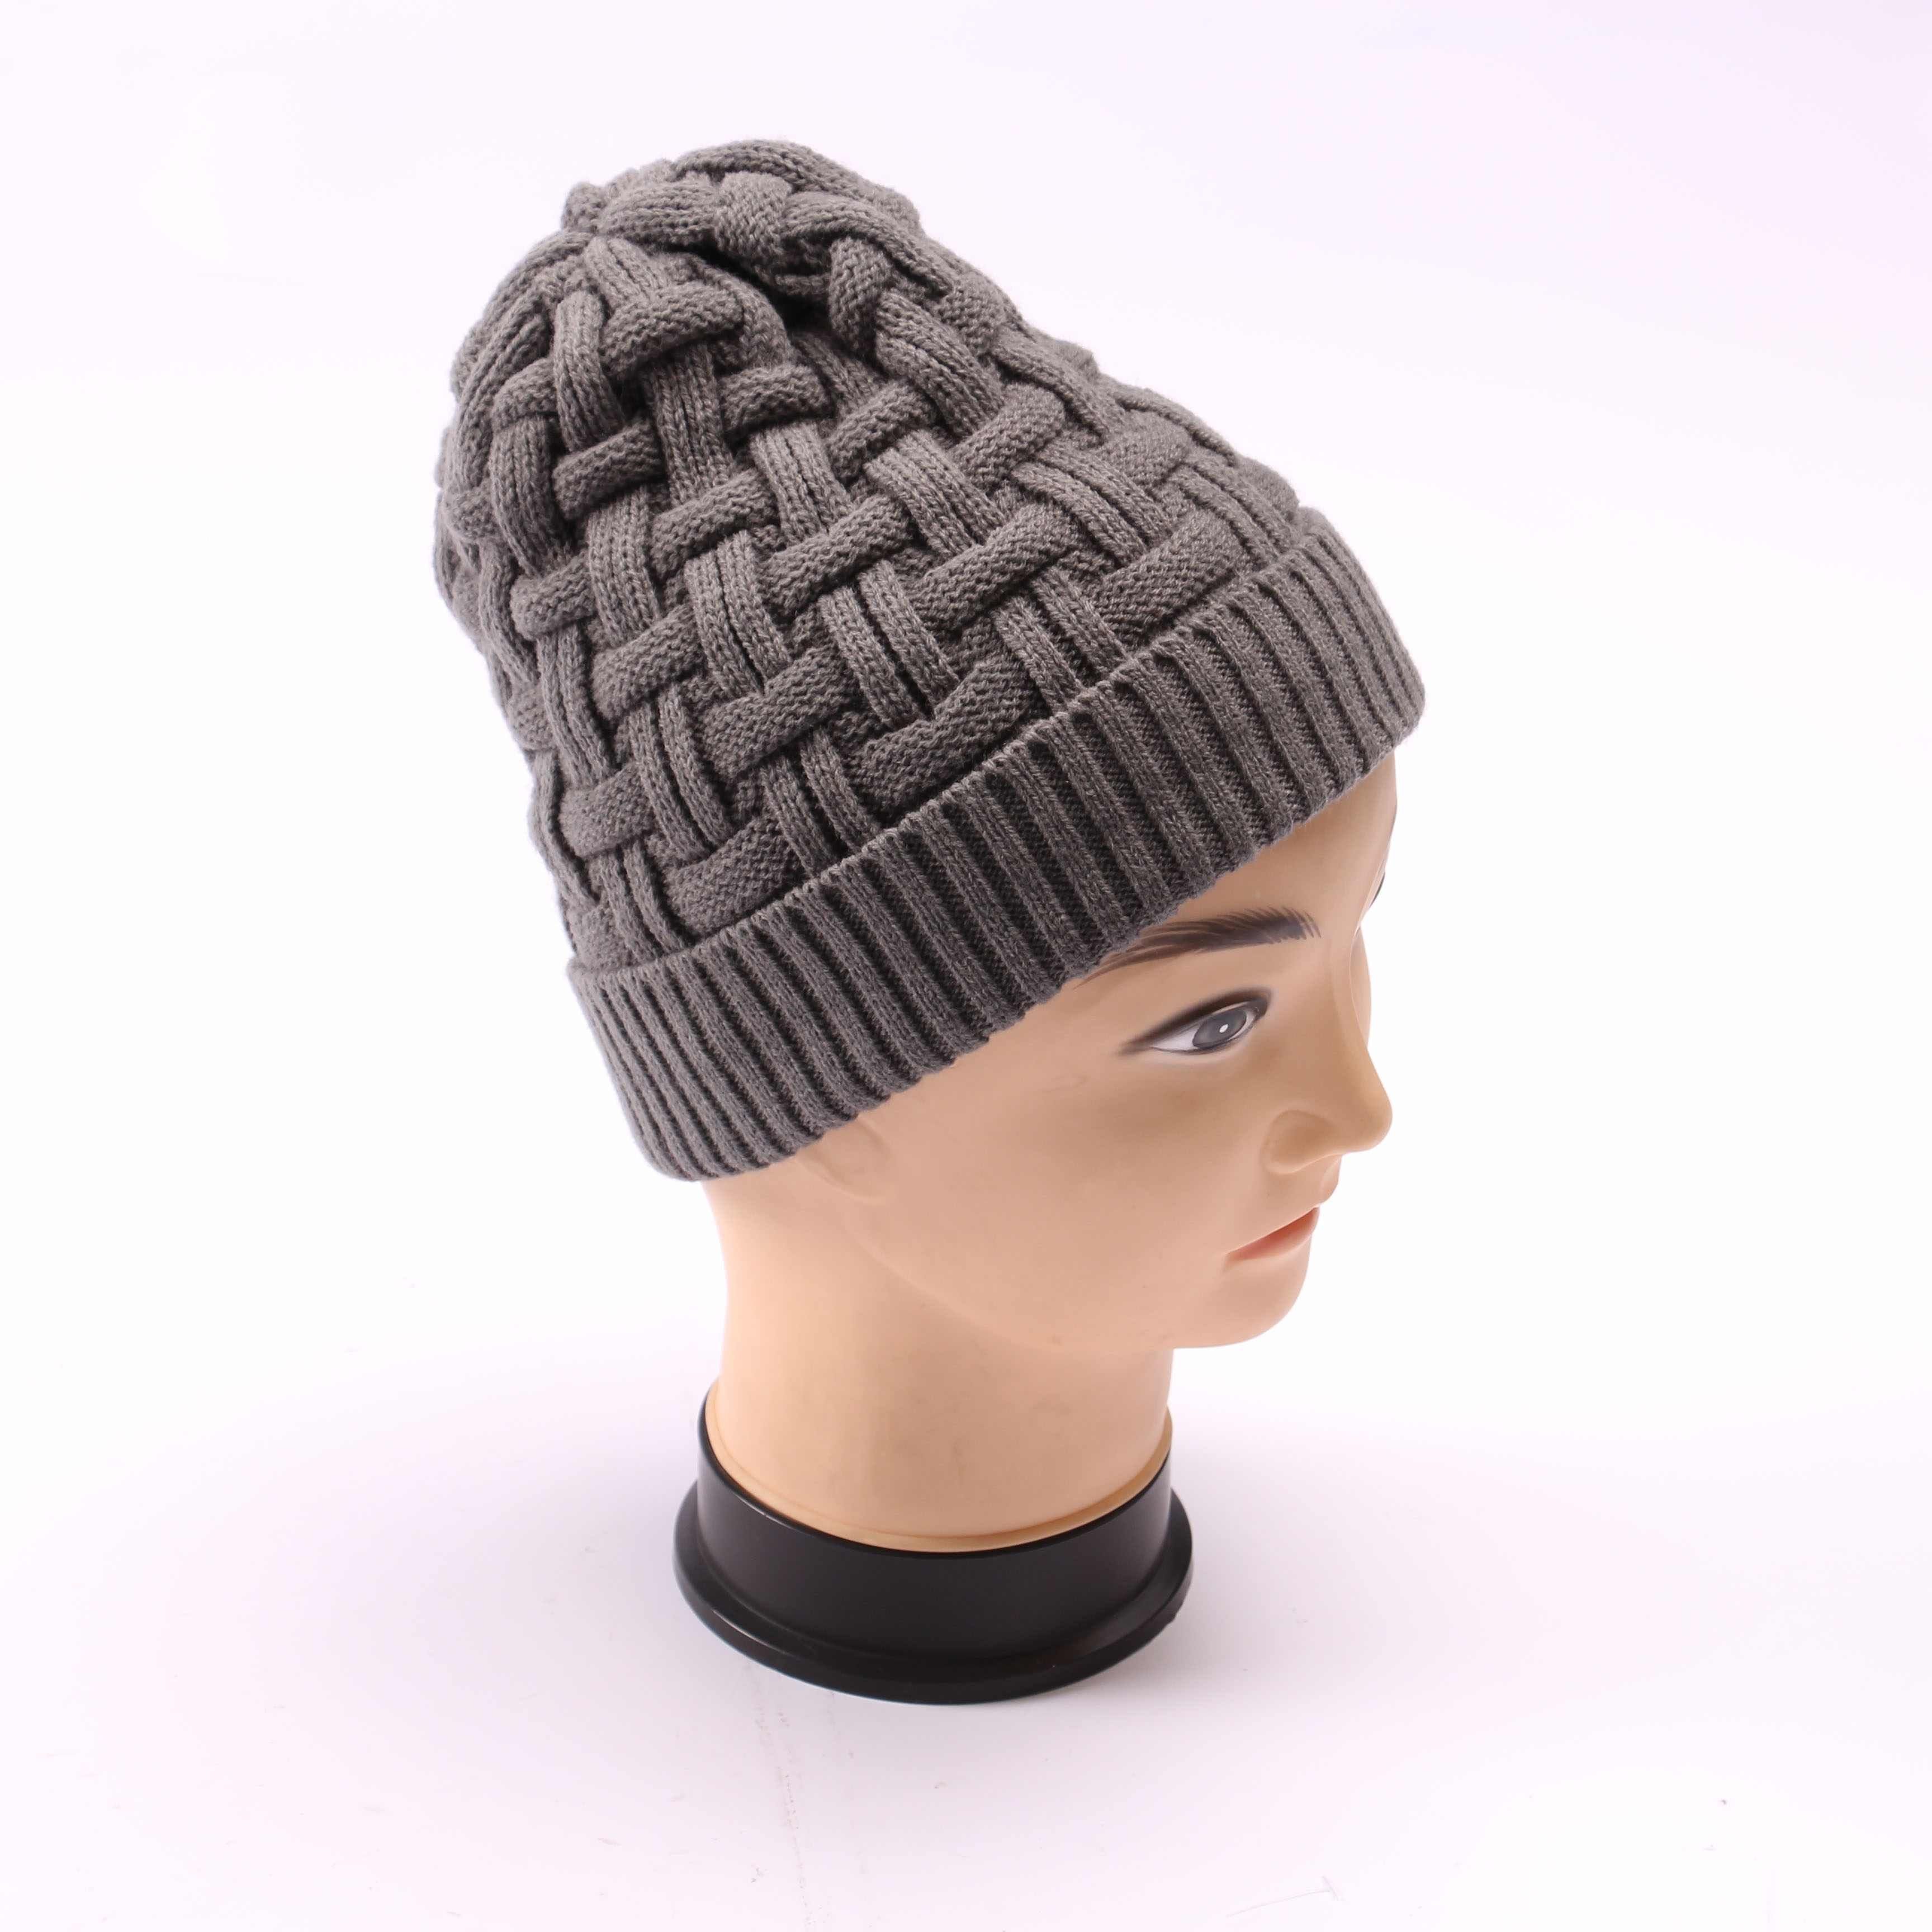 Pin by Sophia Zhu on Fashion winter hat-Adult  2fd39ef54fe